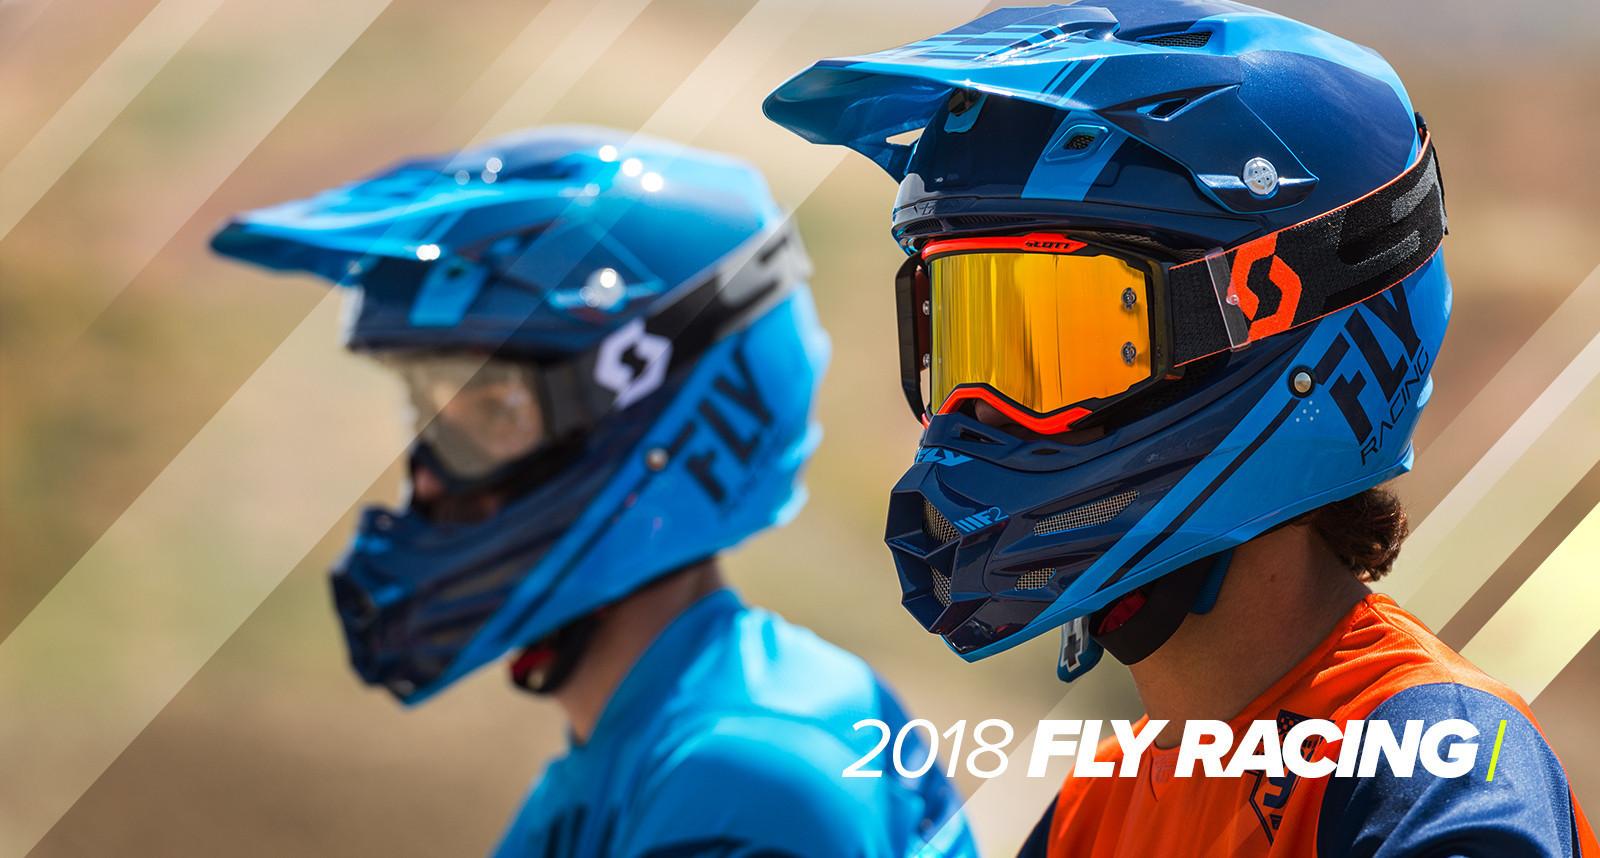 FLY Racing 2018 Racewear Collection